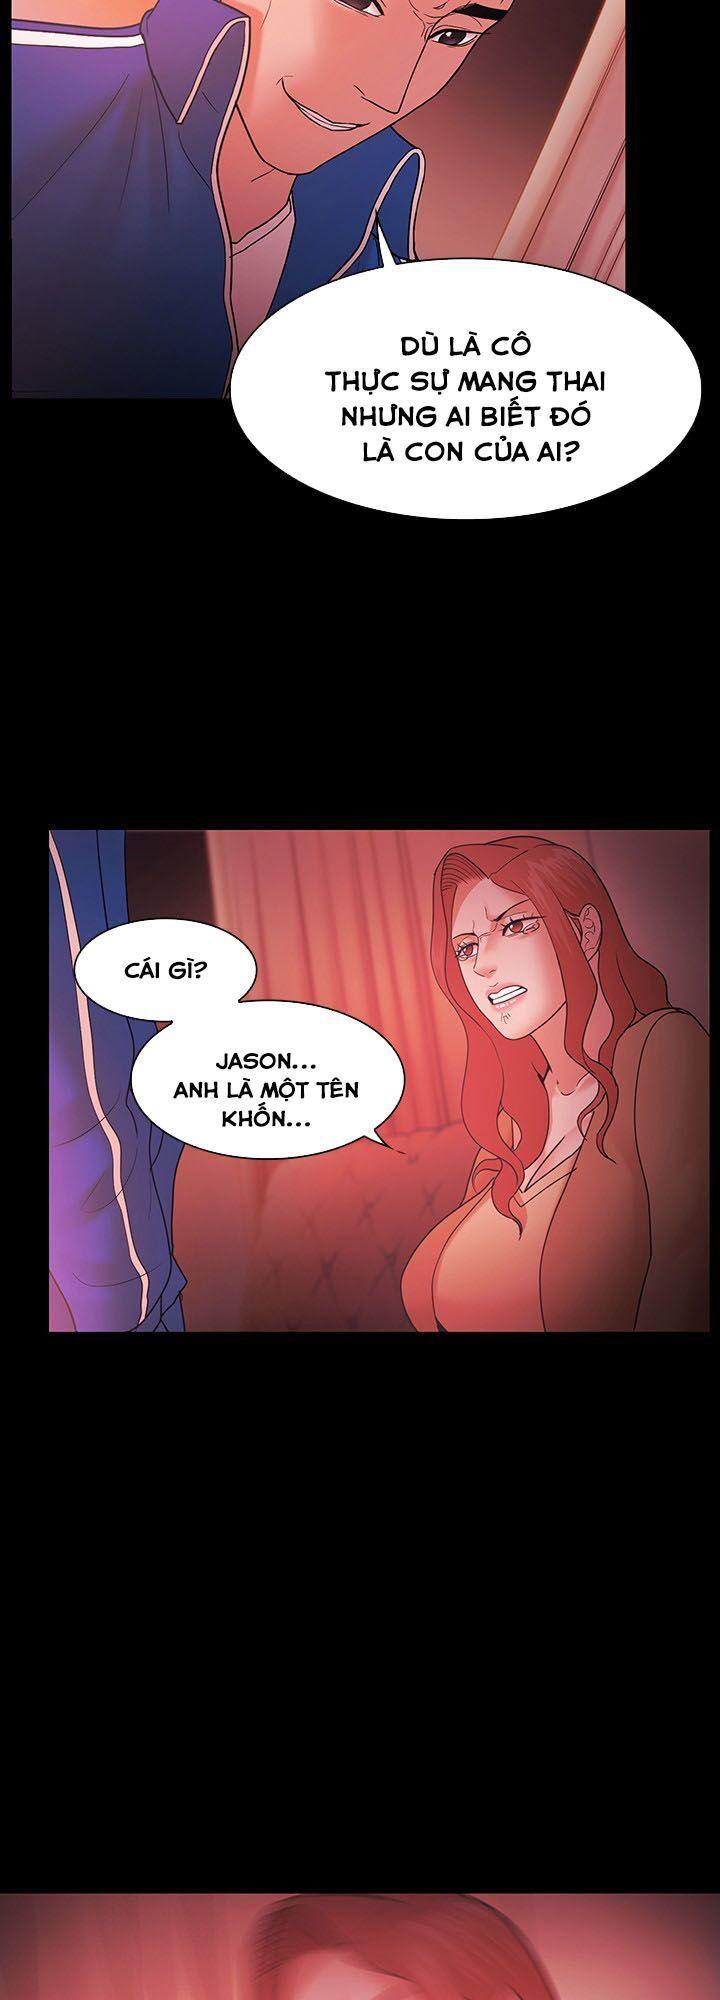 Loser Chapter 68 - Trang 16